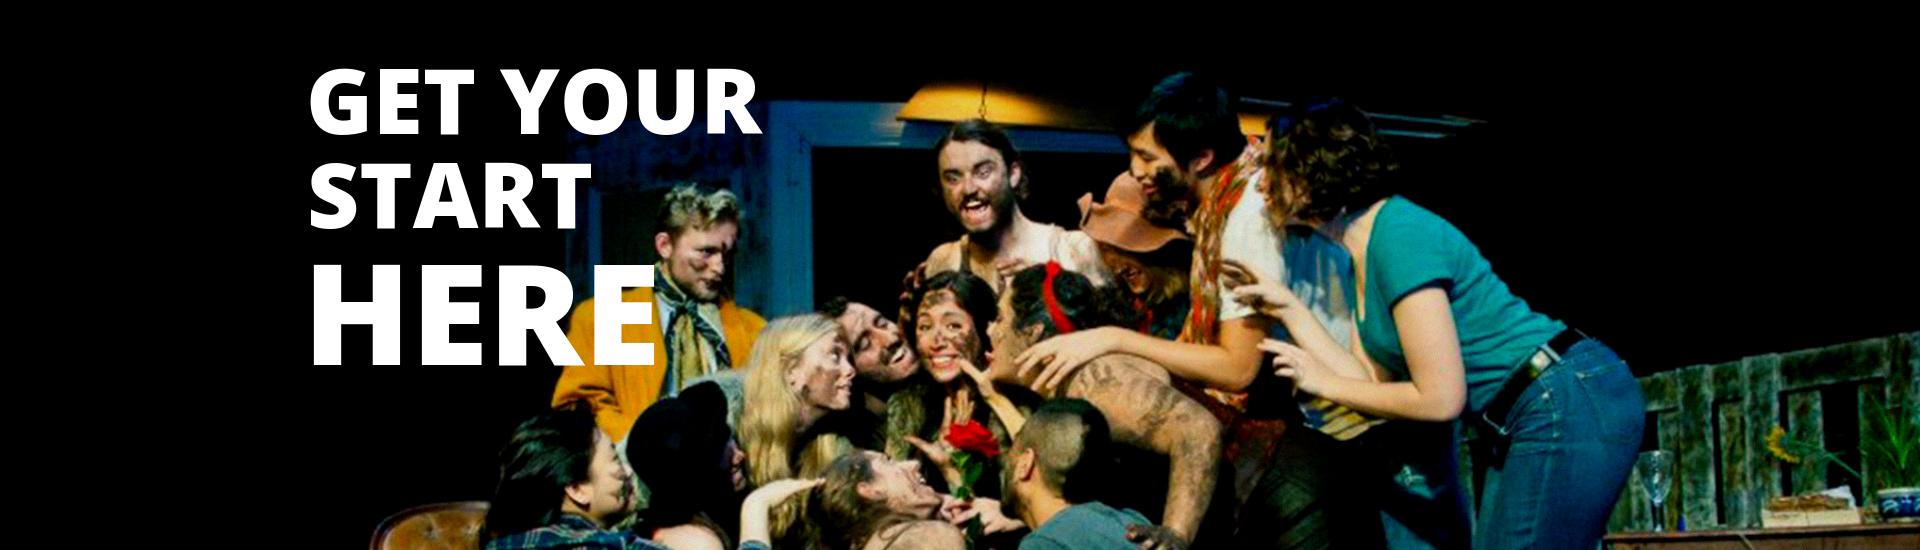 Centre for Drama, Theatre & Performance Studies | University